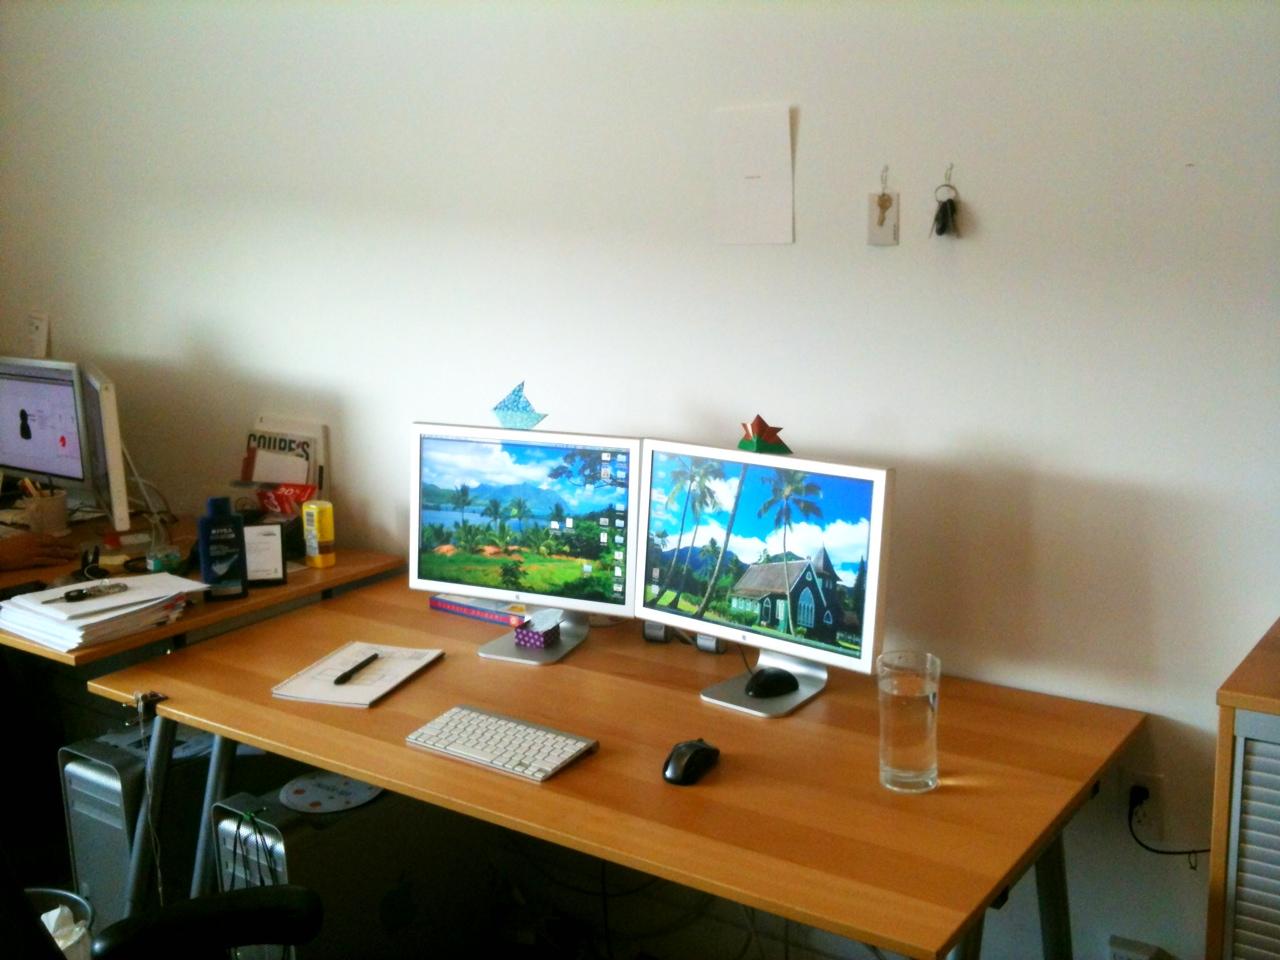 minimalist lifestyle how to start an essay